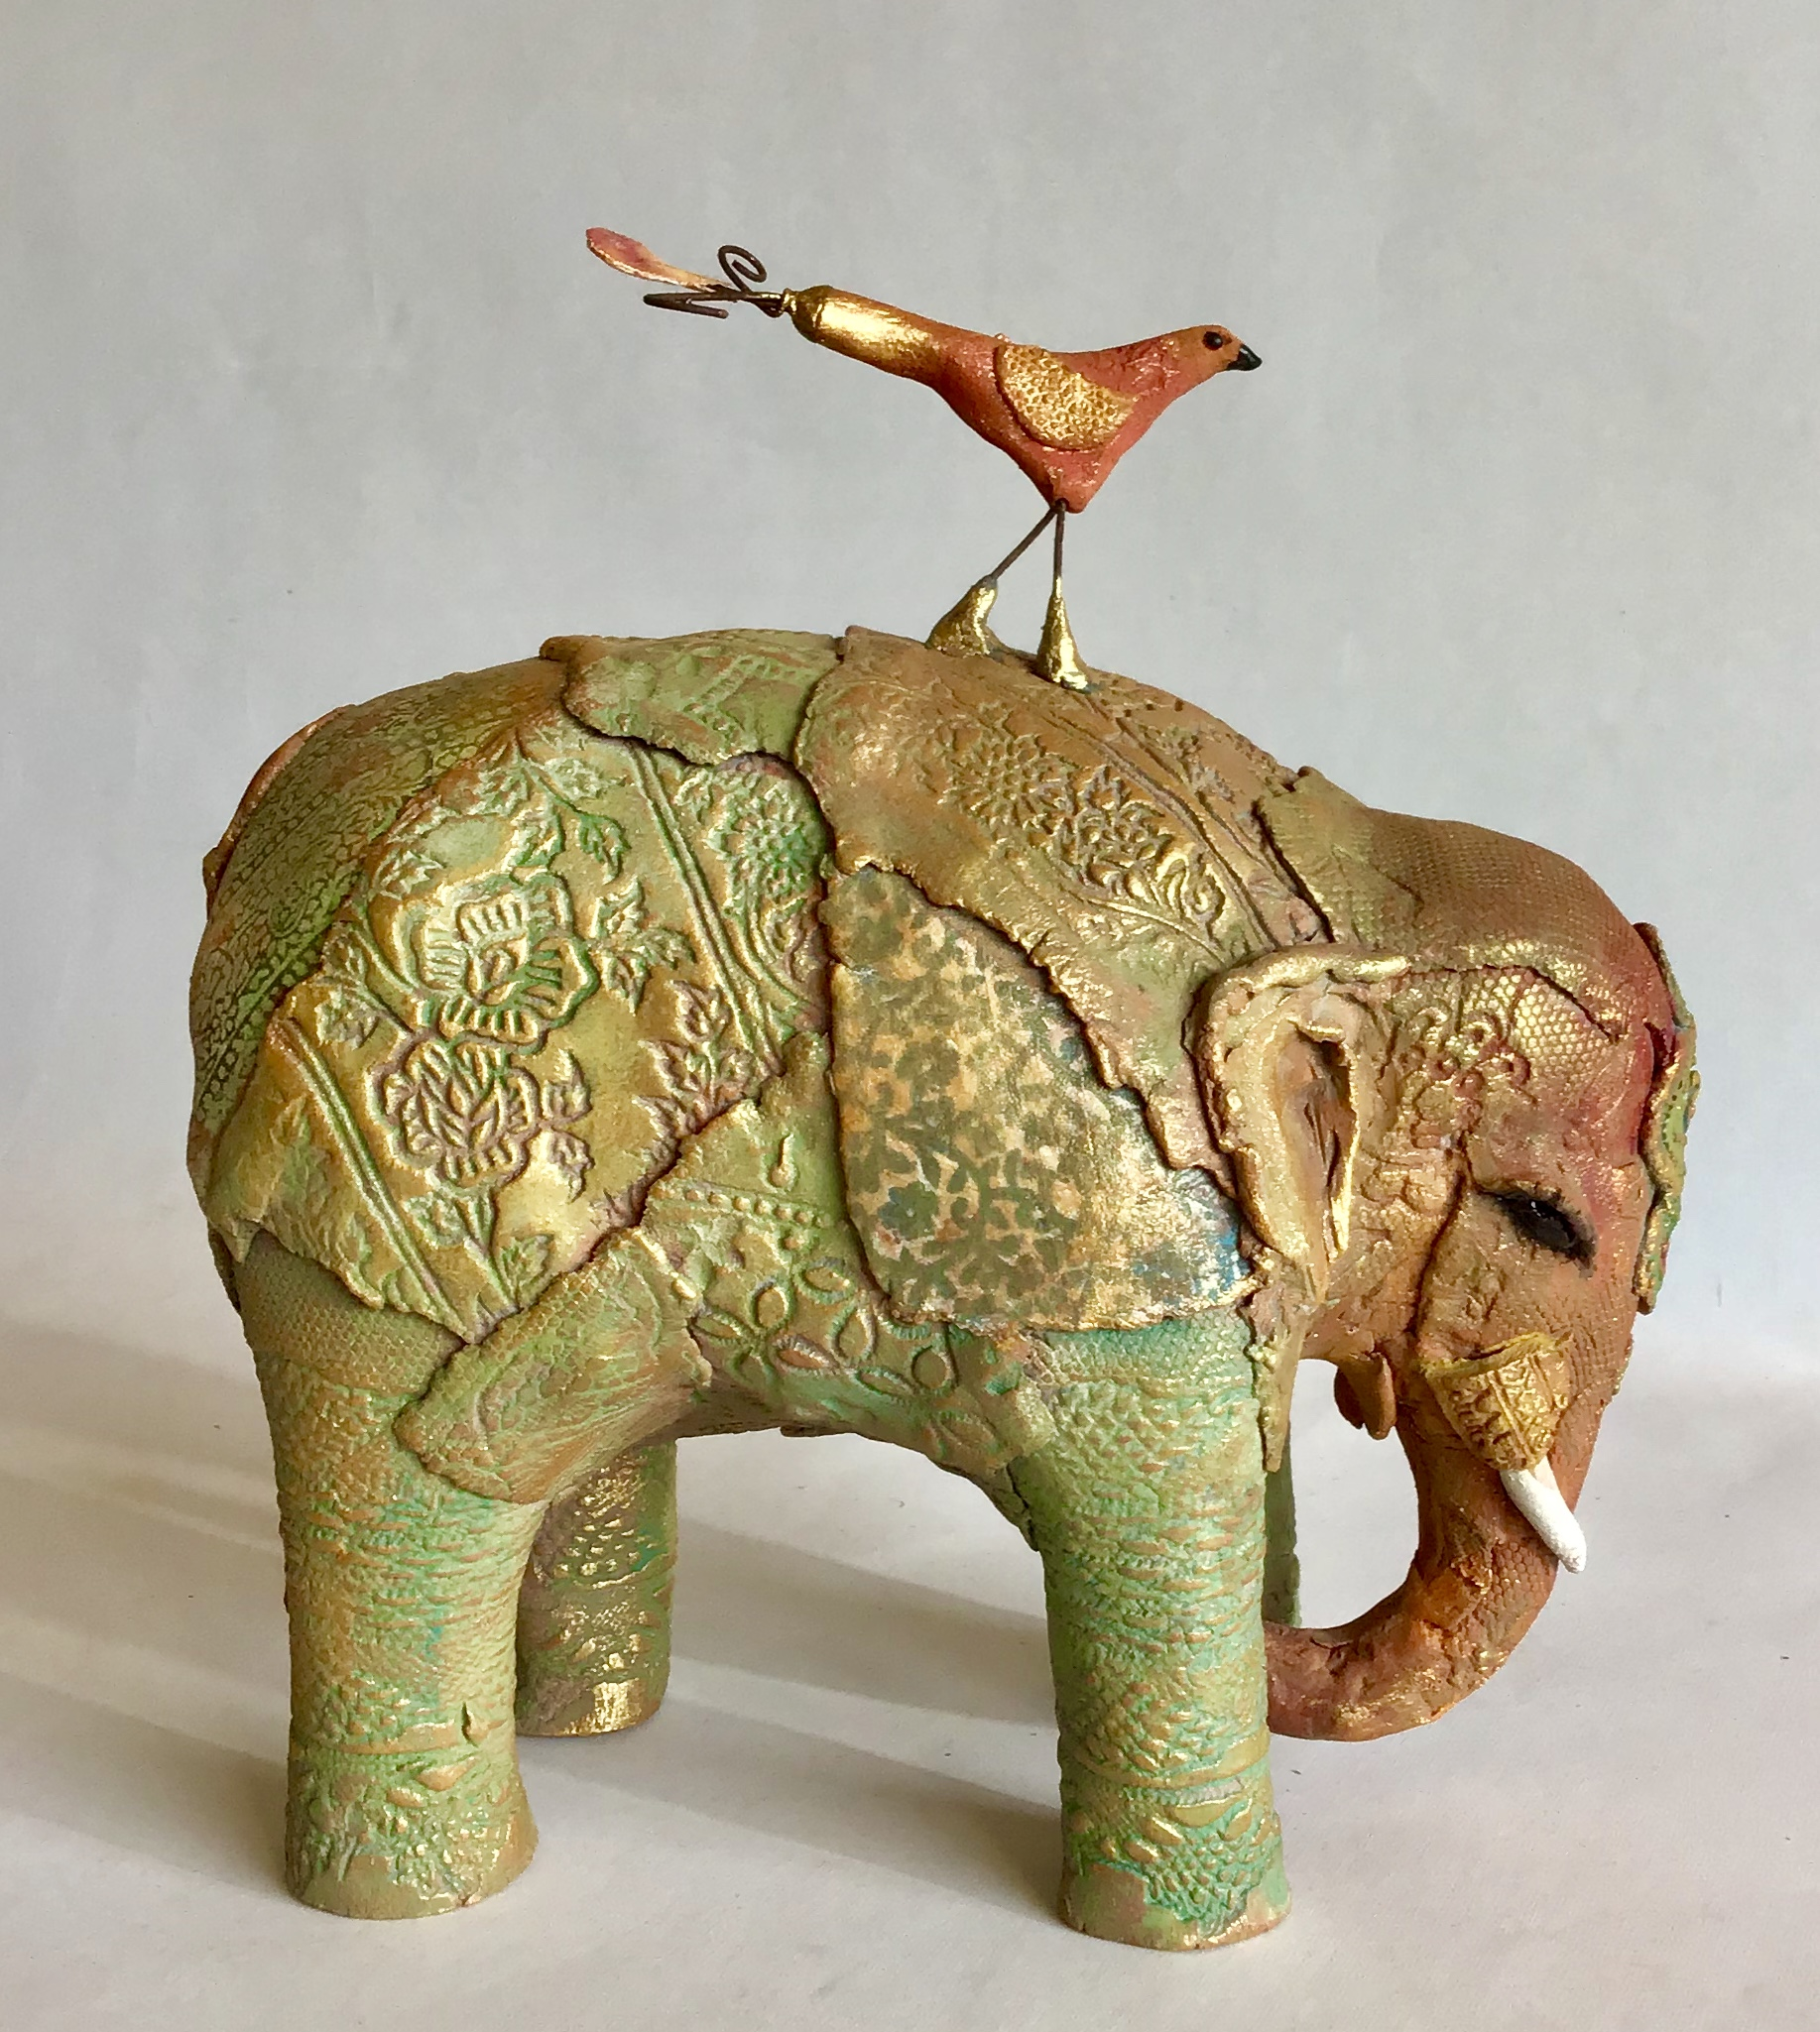 'Anil' by artist Pratima Kramer